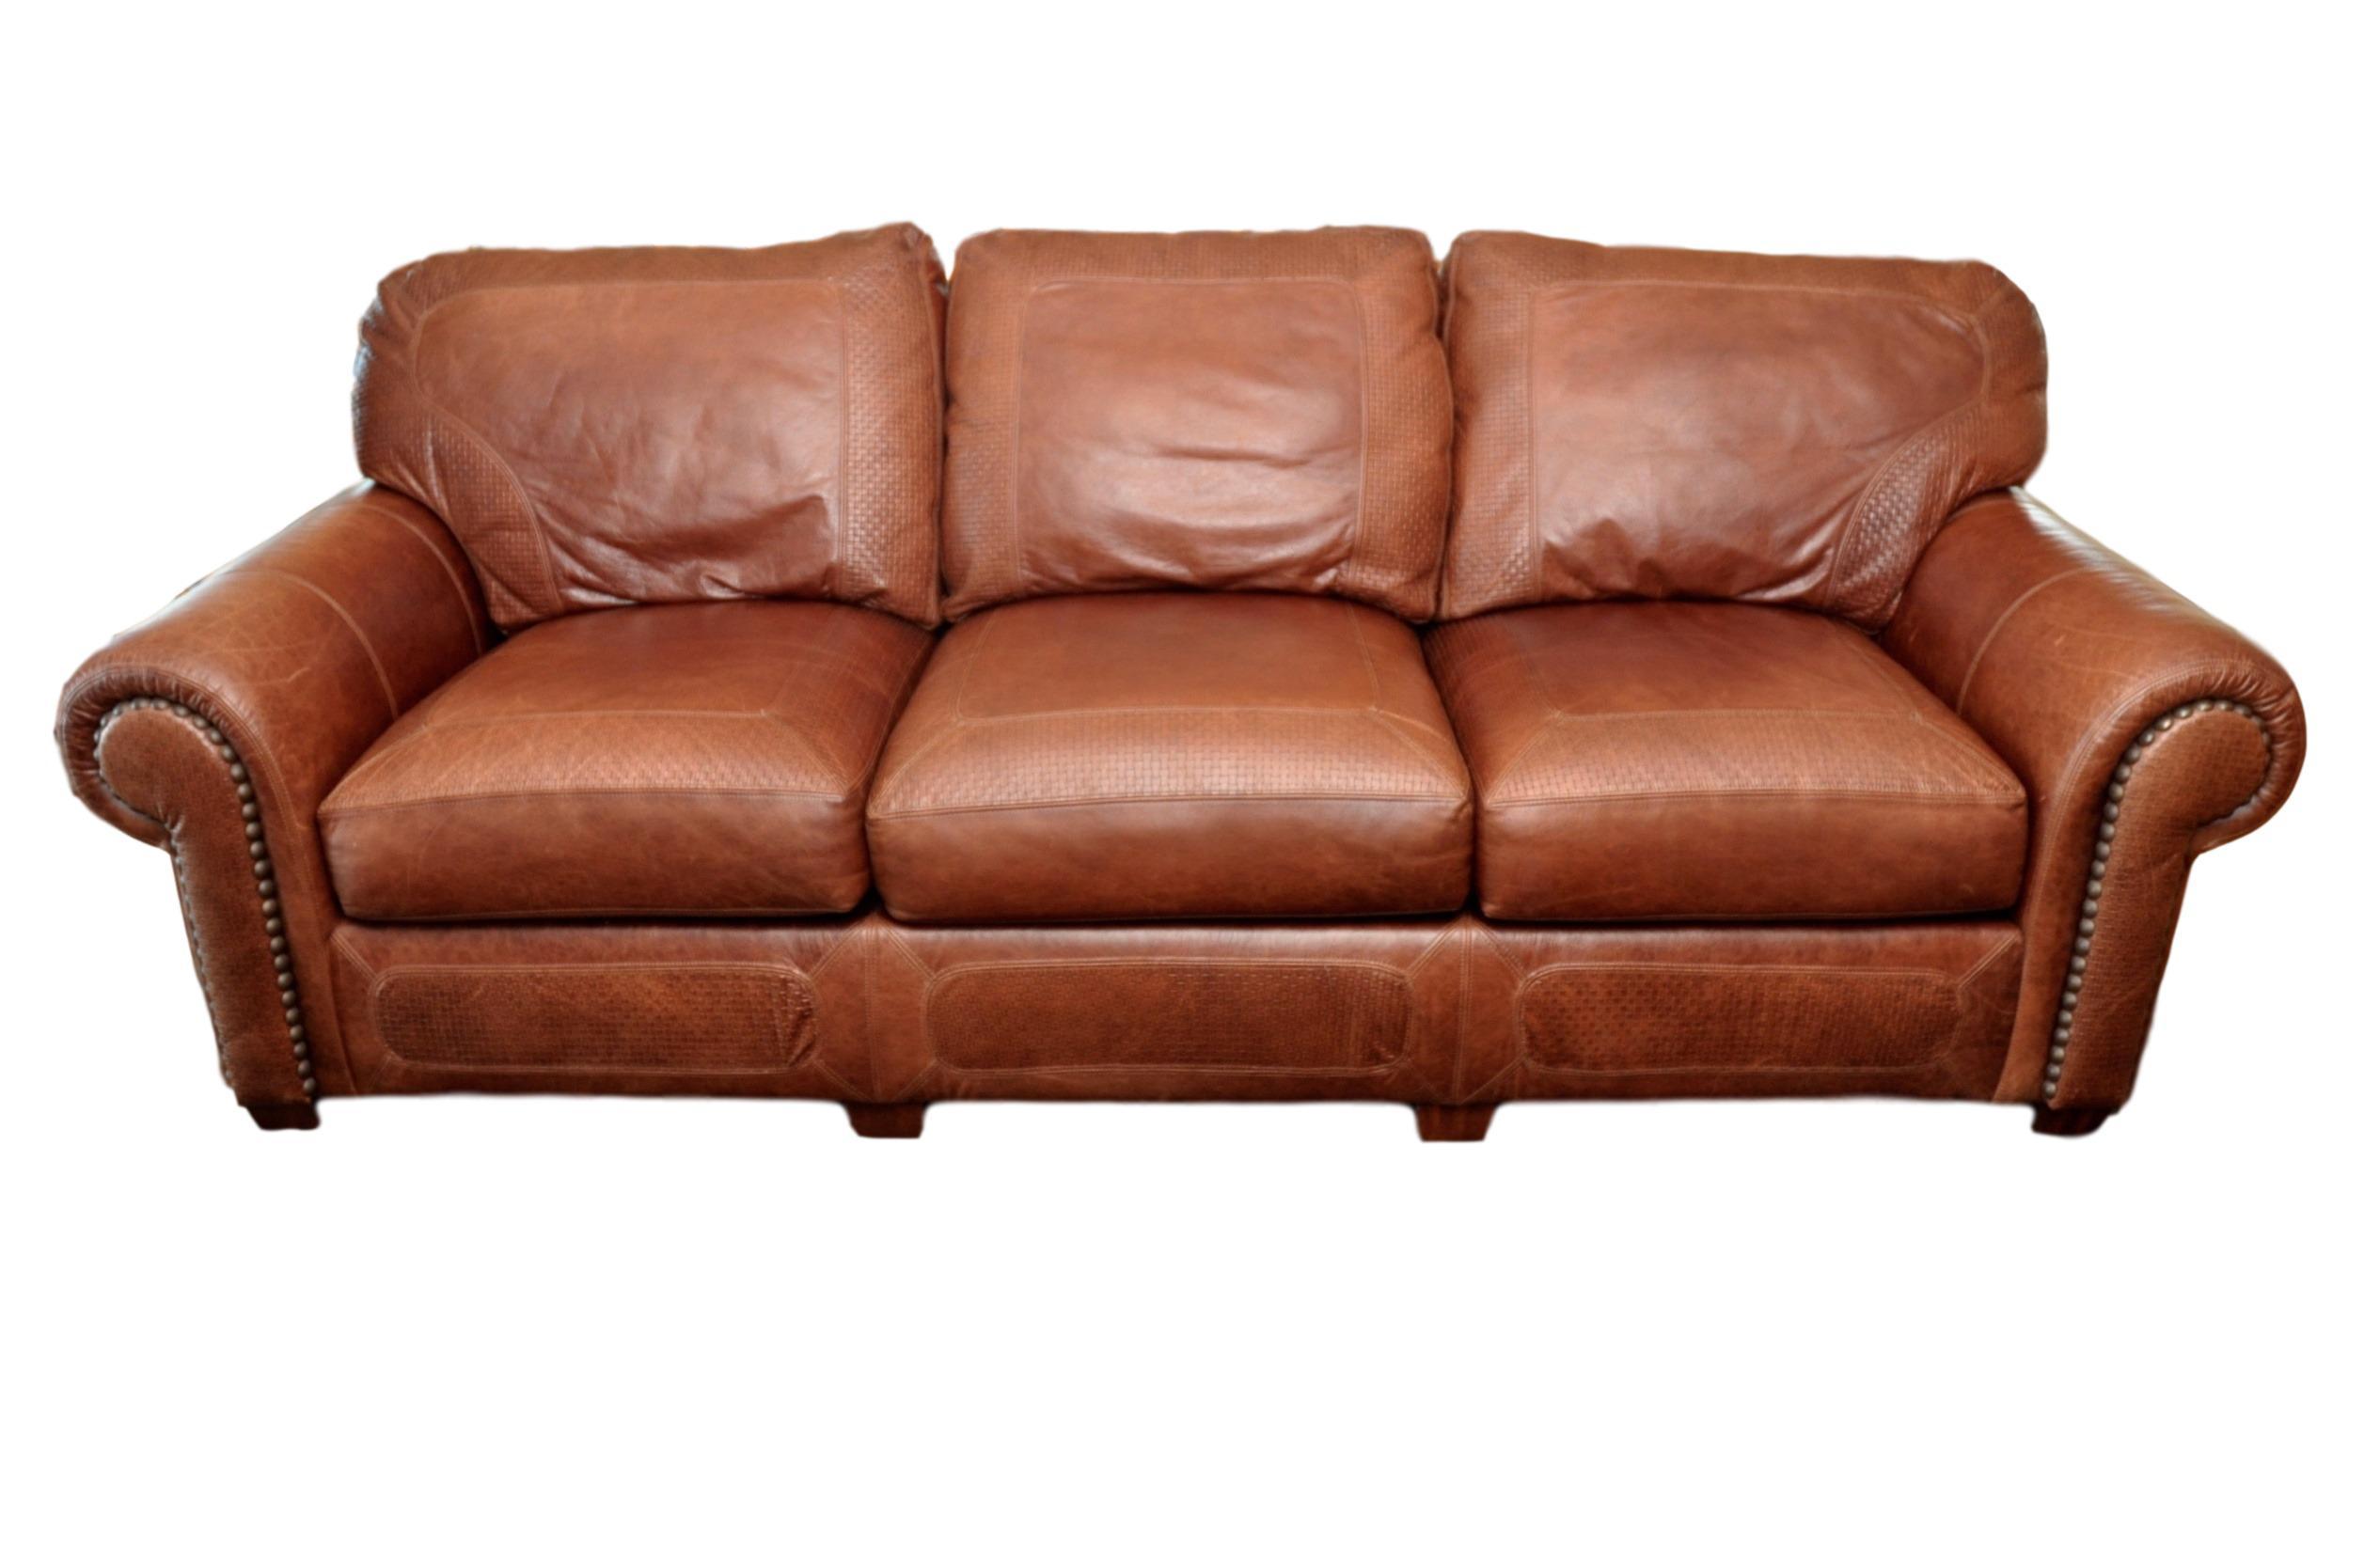 Stickley Cibola Internationale Santa Fe Style Leather Sofa